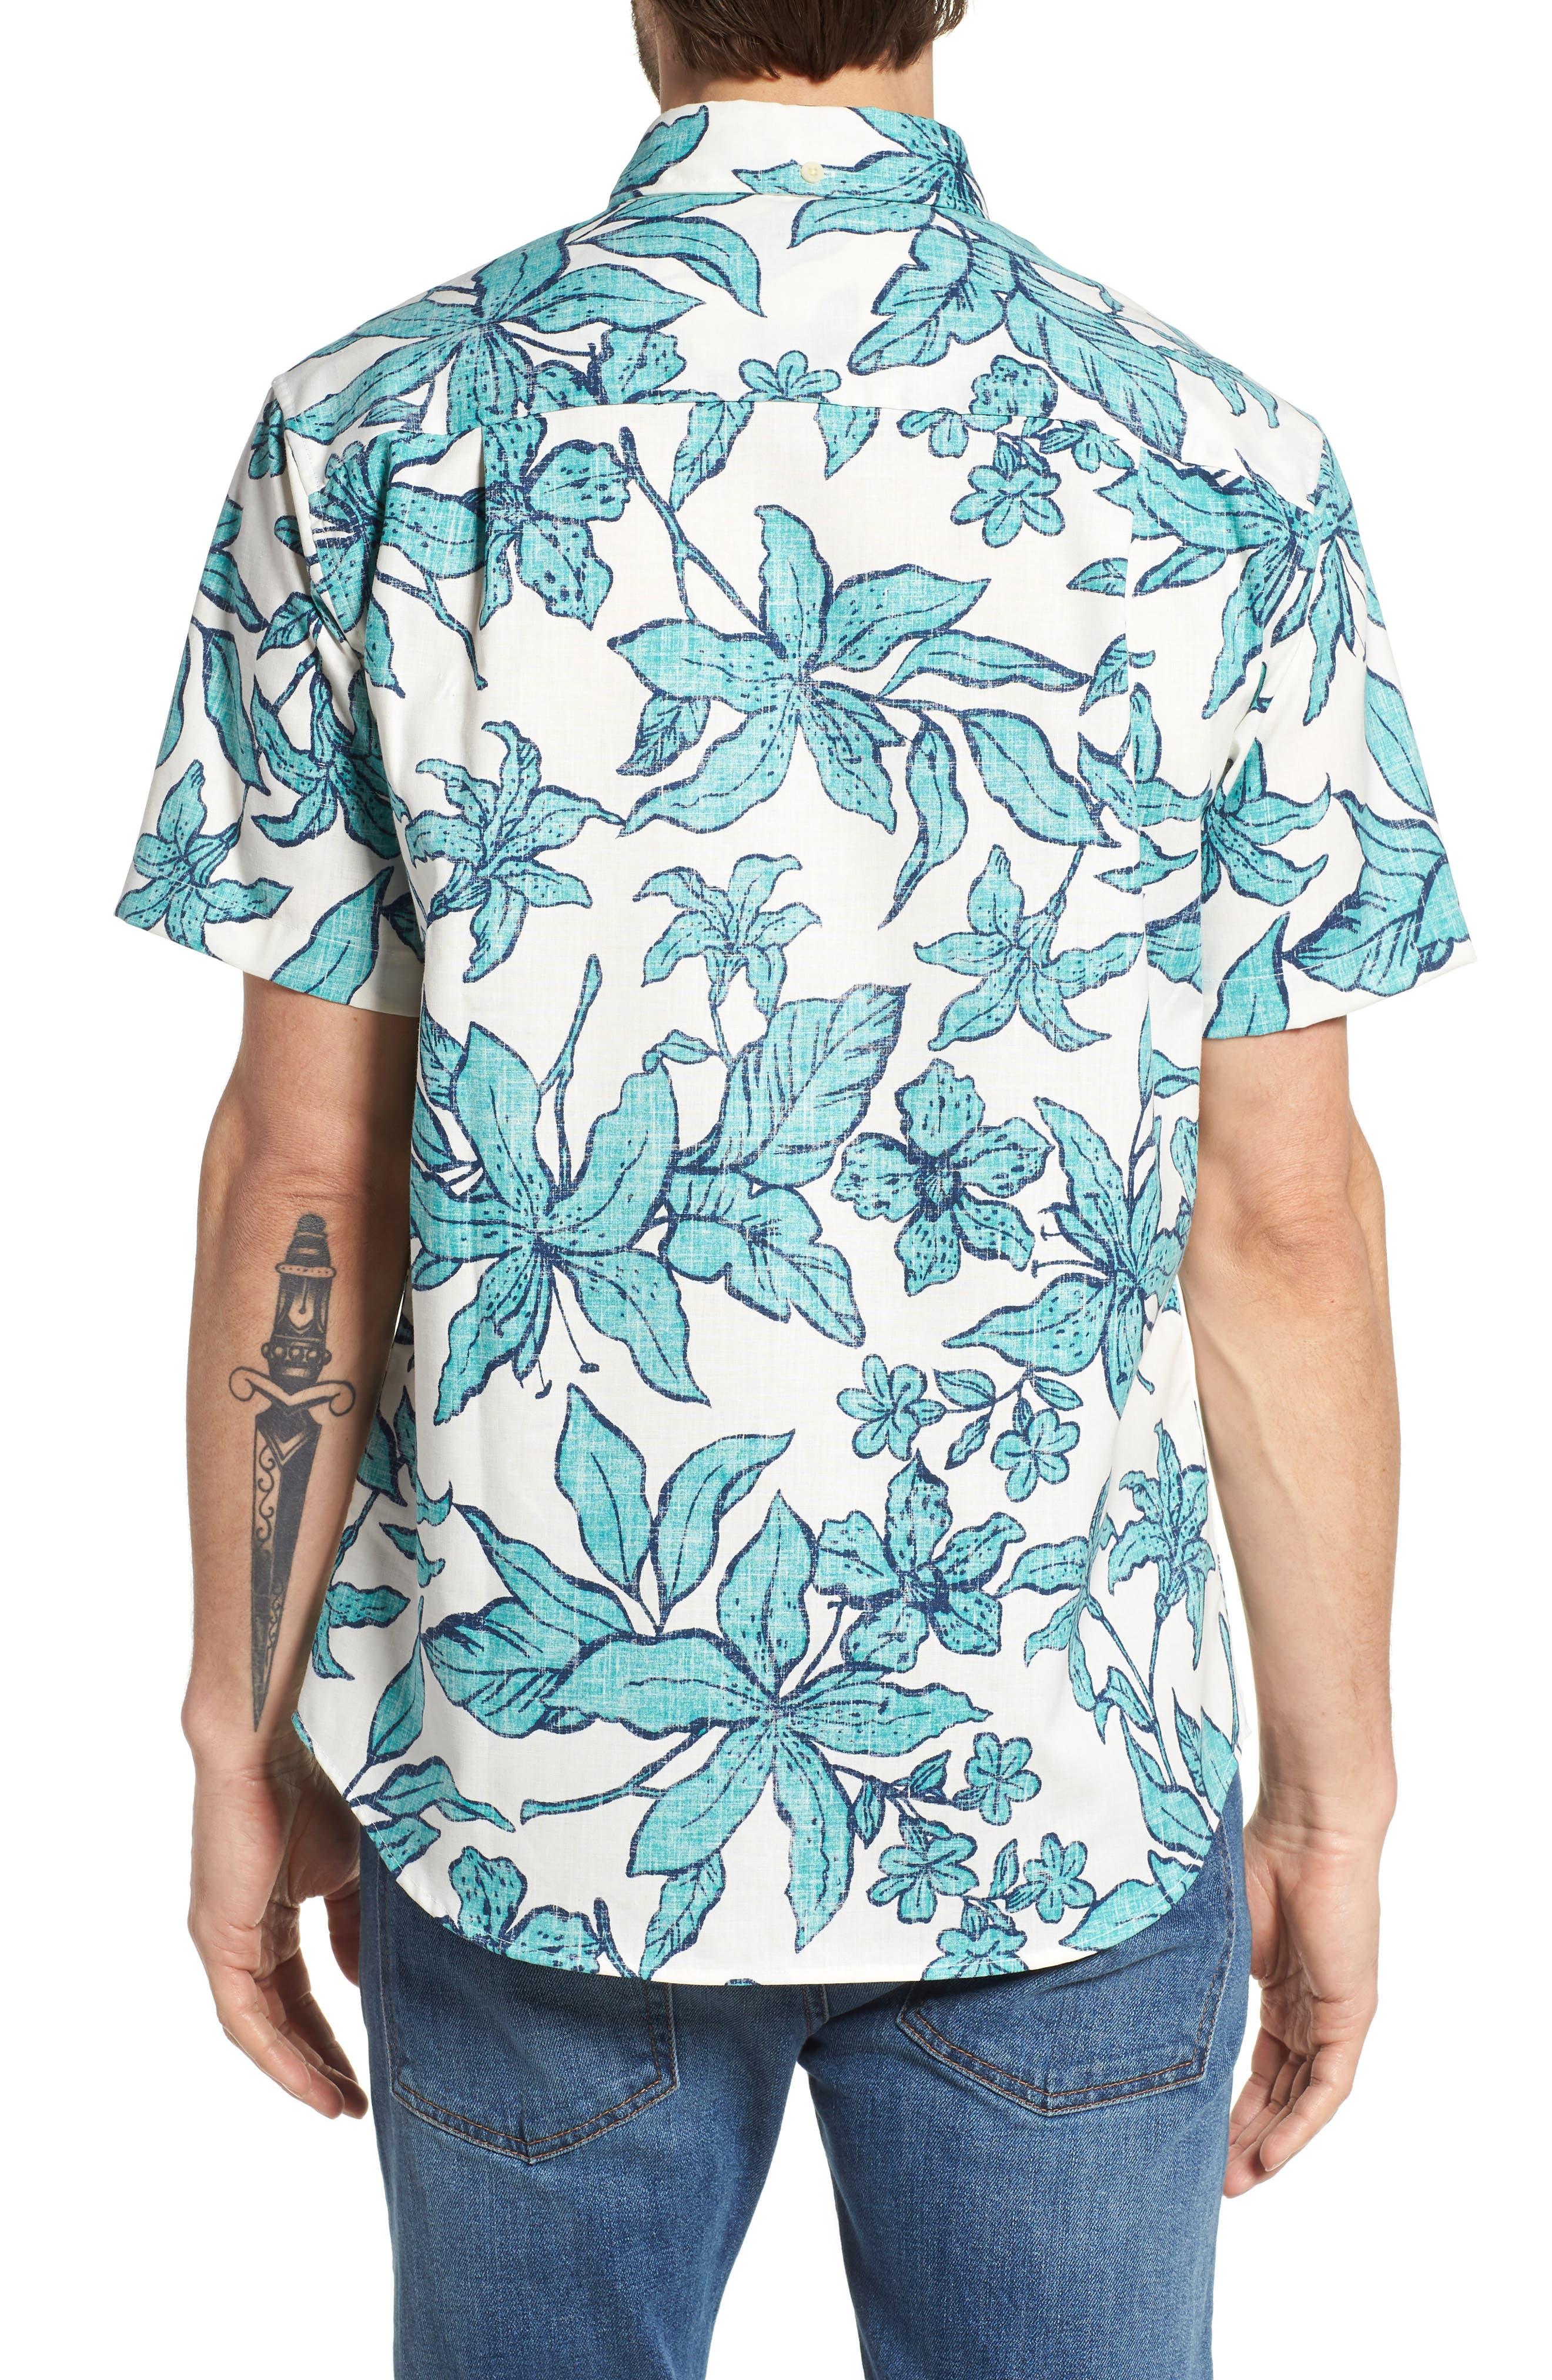 Luhiehu Tailored Fit Print Camp Shirt,                             Alternate thumbnail 2, color,                             104